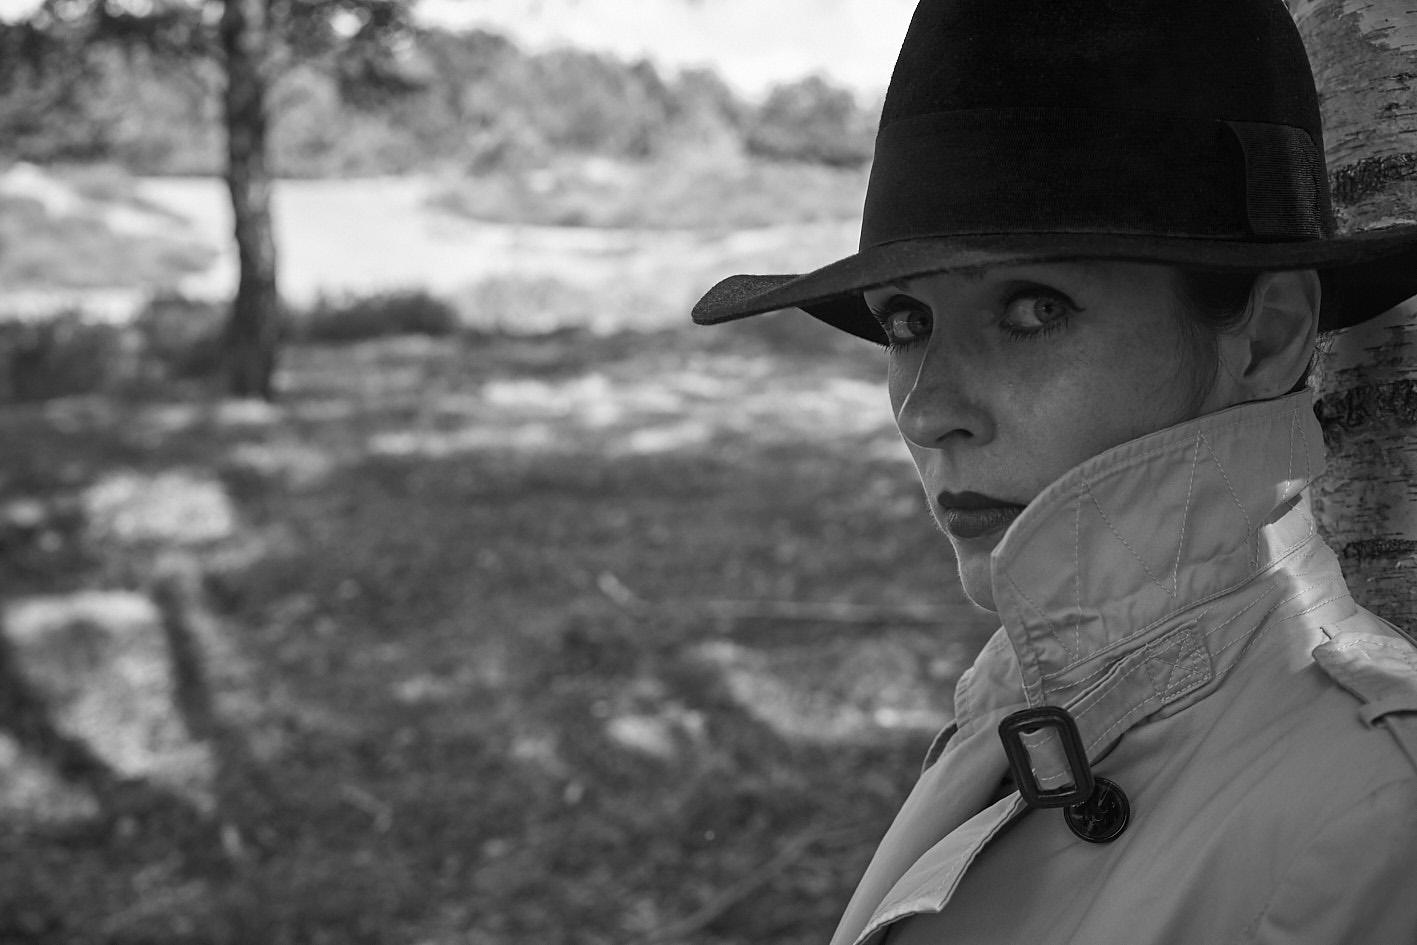 Porträt, Frau im Trenchcoat Film Noir, Köln © Monika Probst, Köln